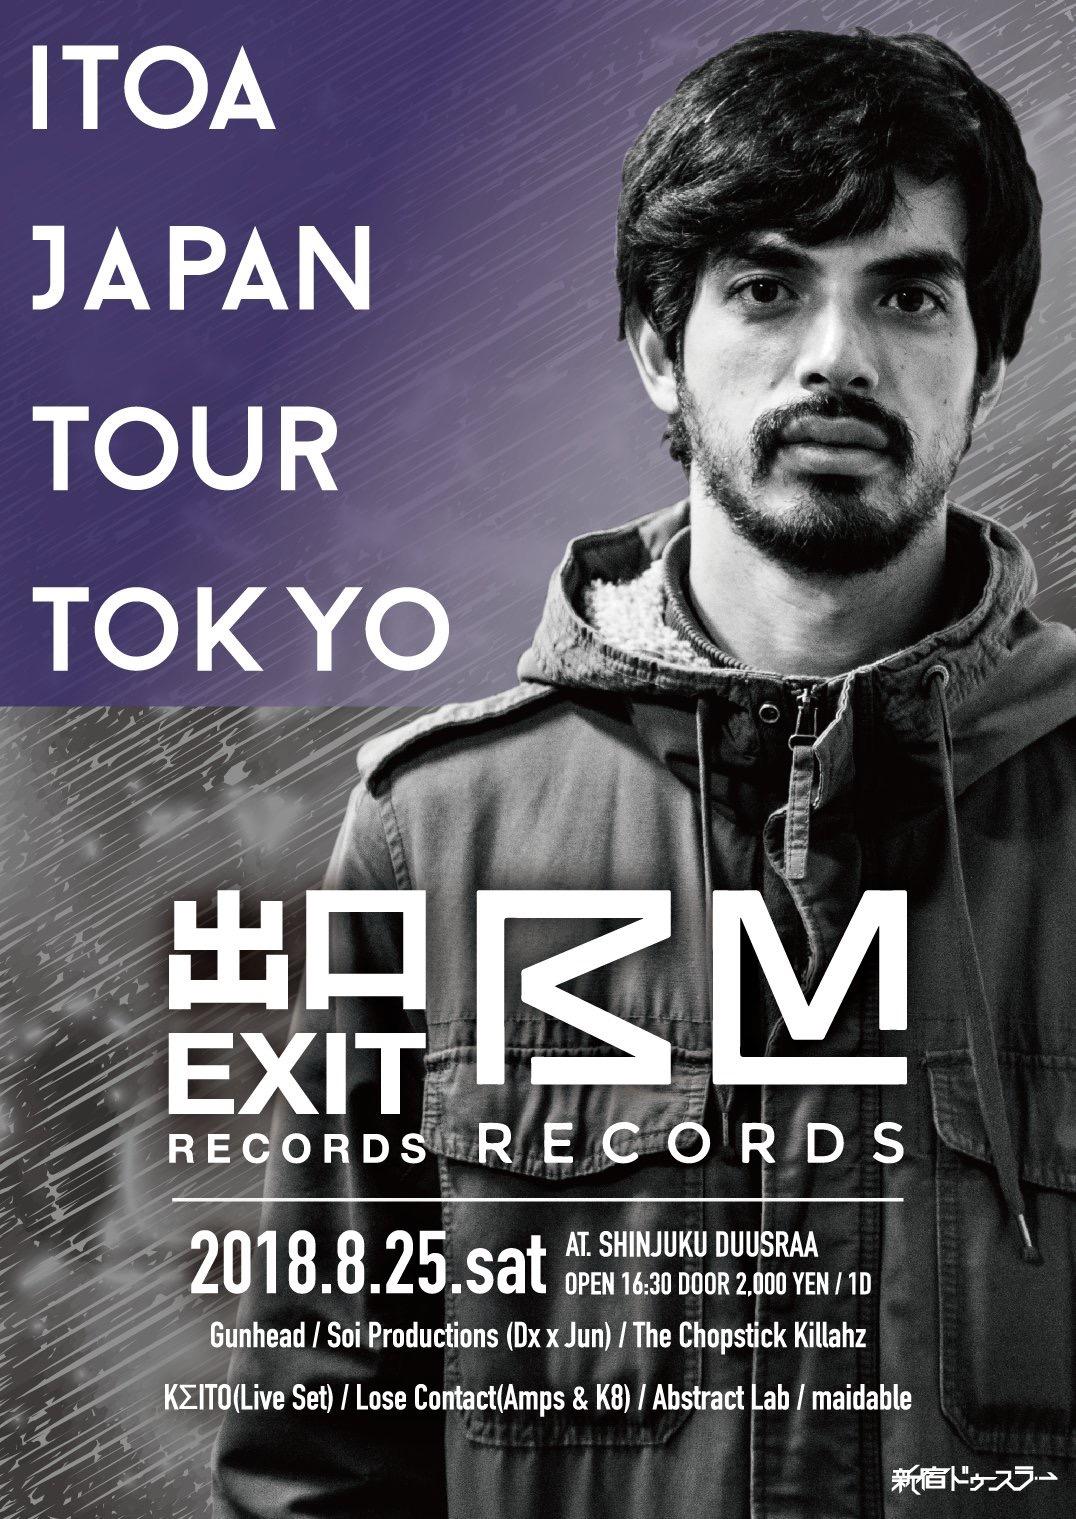 ITOA Japan Tour in Tokyo